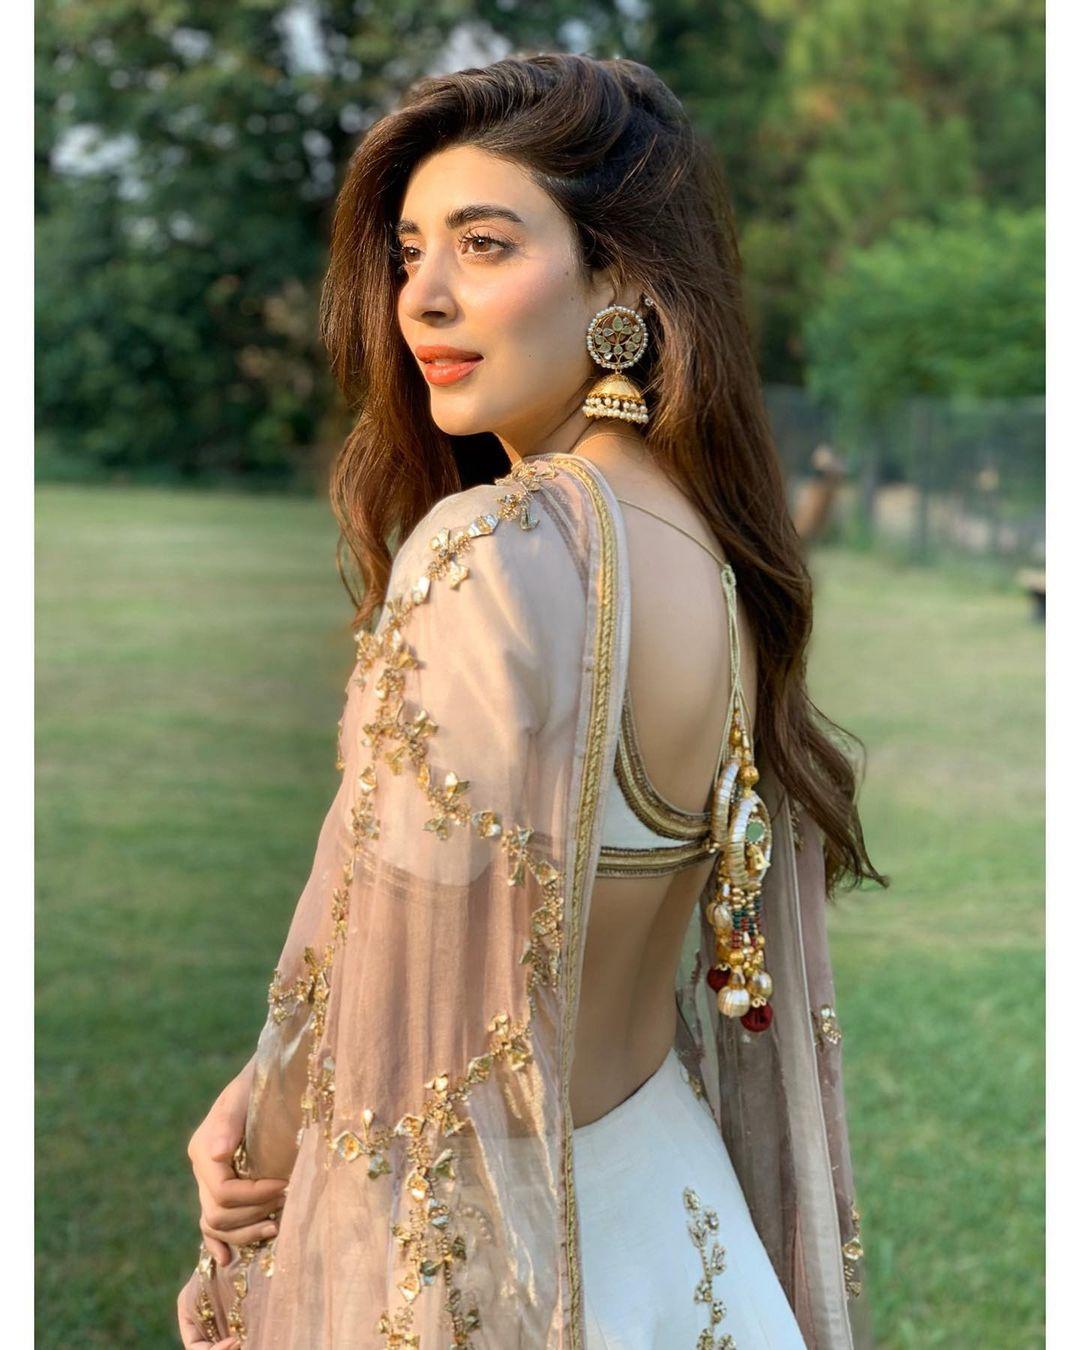 Actress Urwa Hocane Beautiful Pictures from her Instagram